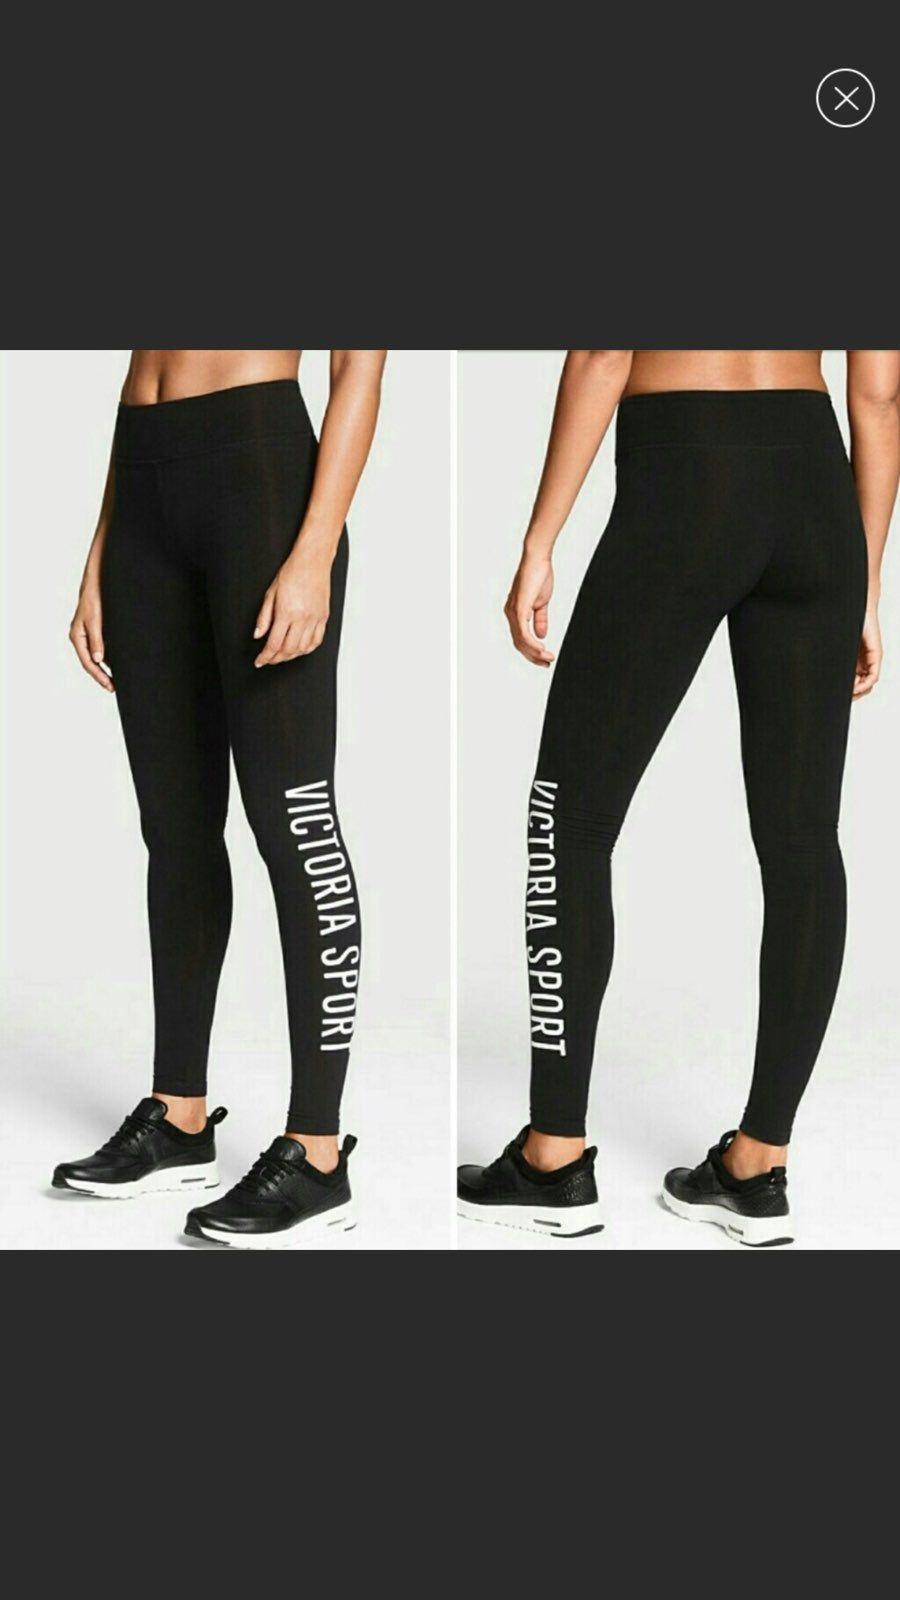 VSX sport tight Running tights women, Sports wear